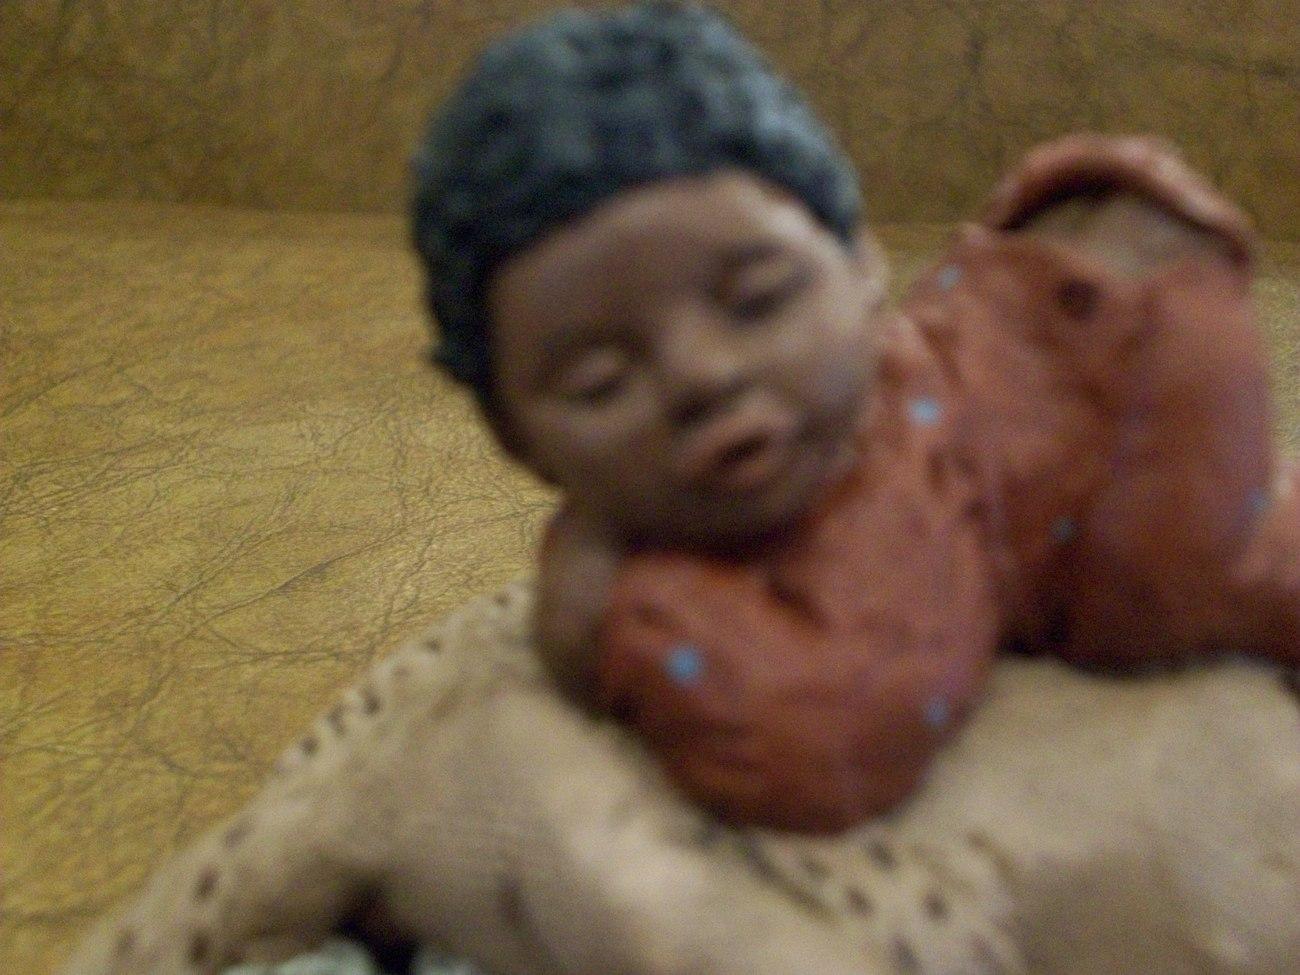 All God's Children - Boone - Item #1510, New in Box w/COA